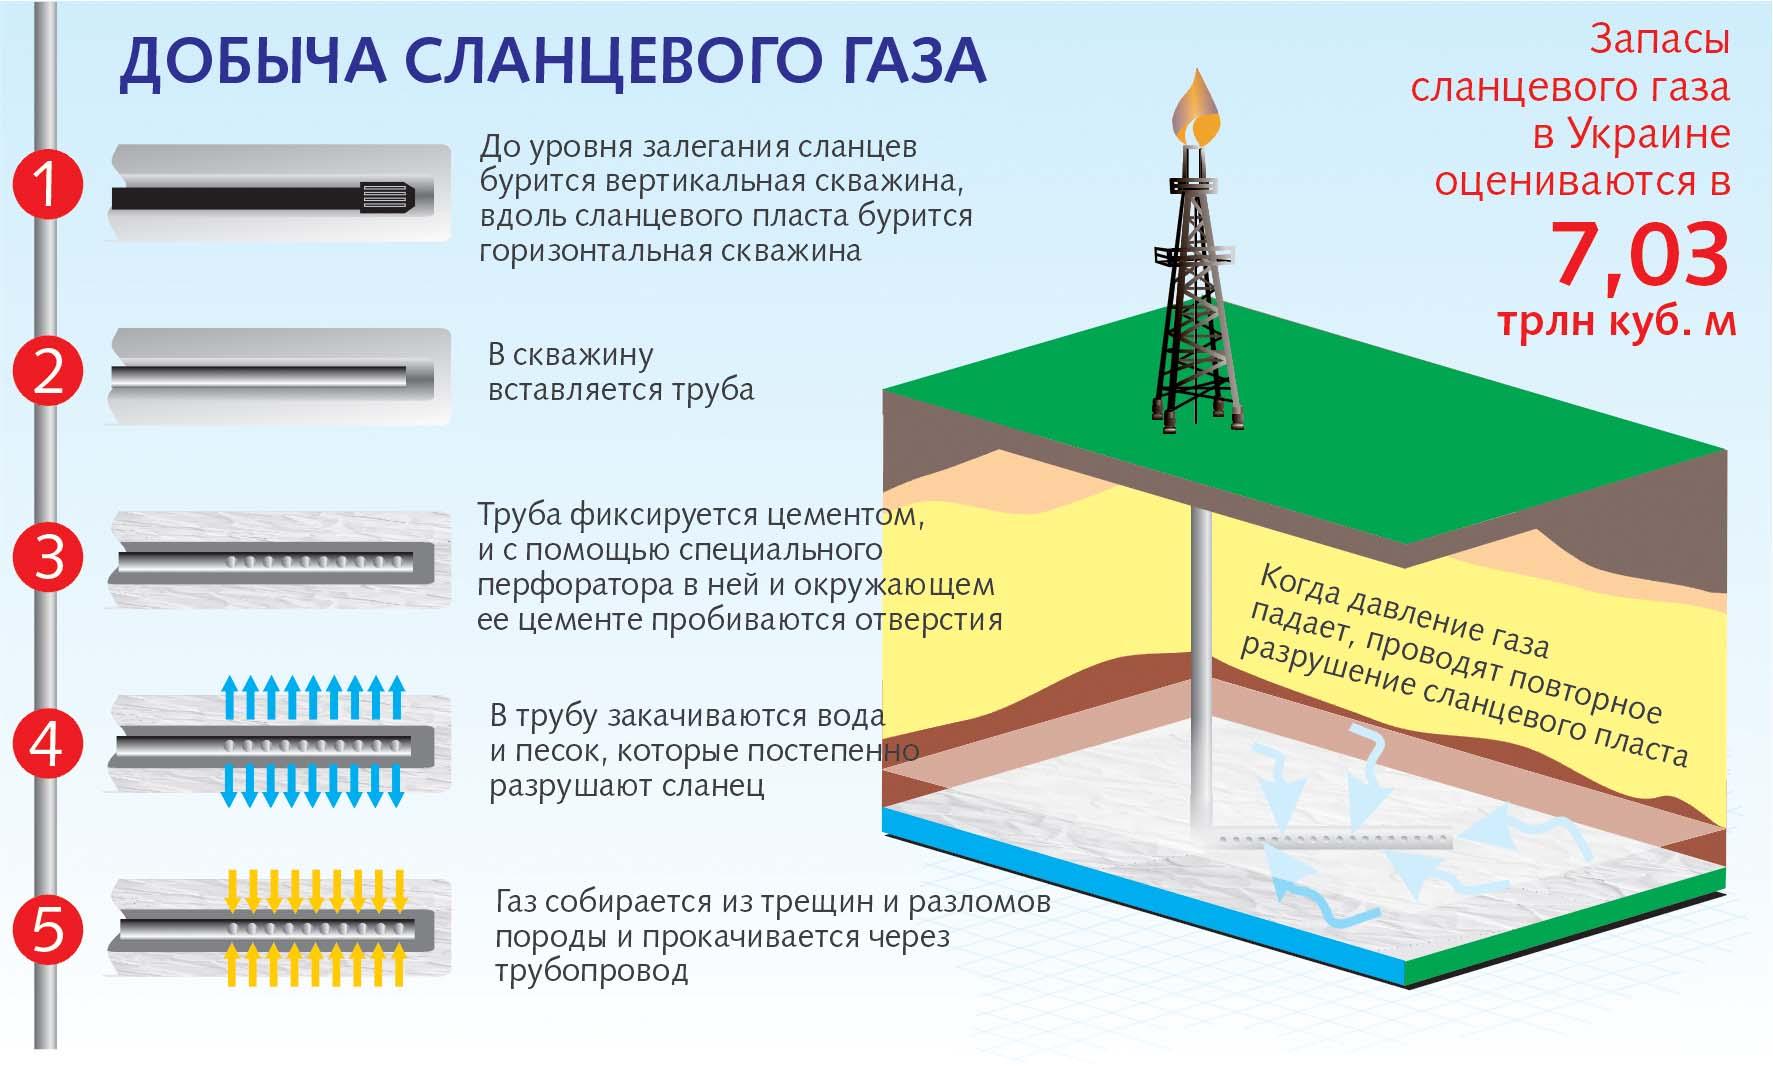 Добыча сланцевого газа, запасы сланцевого газа в Украине, график, рисунок, графика